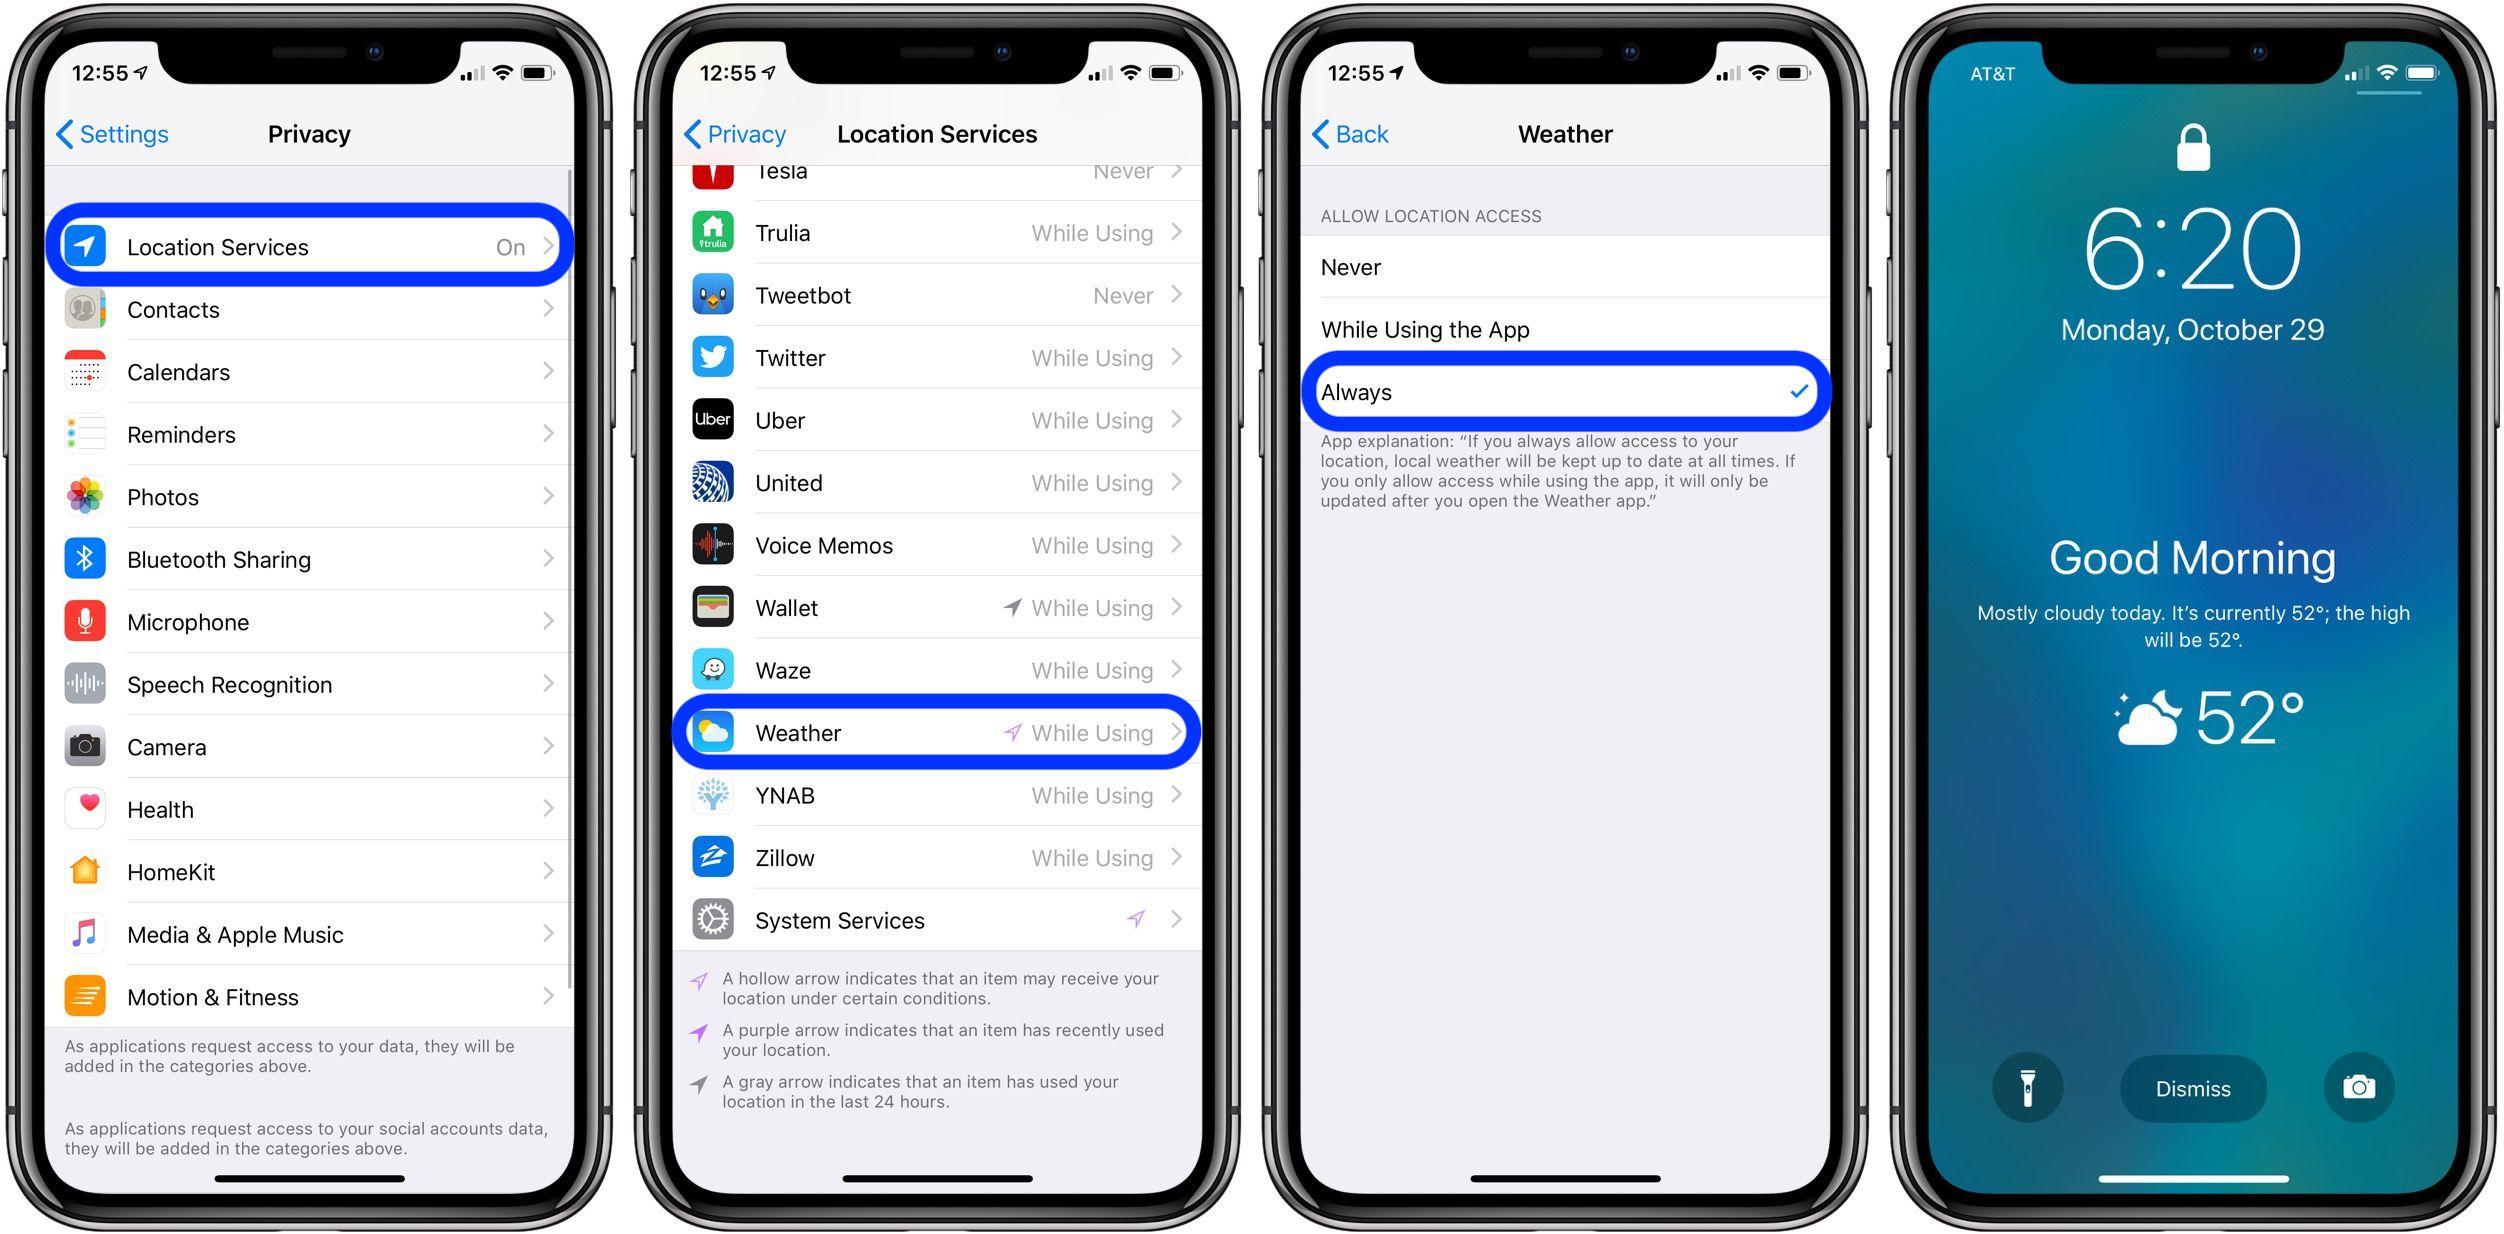 add weather summary to iPhone Lock screen